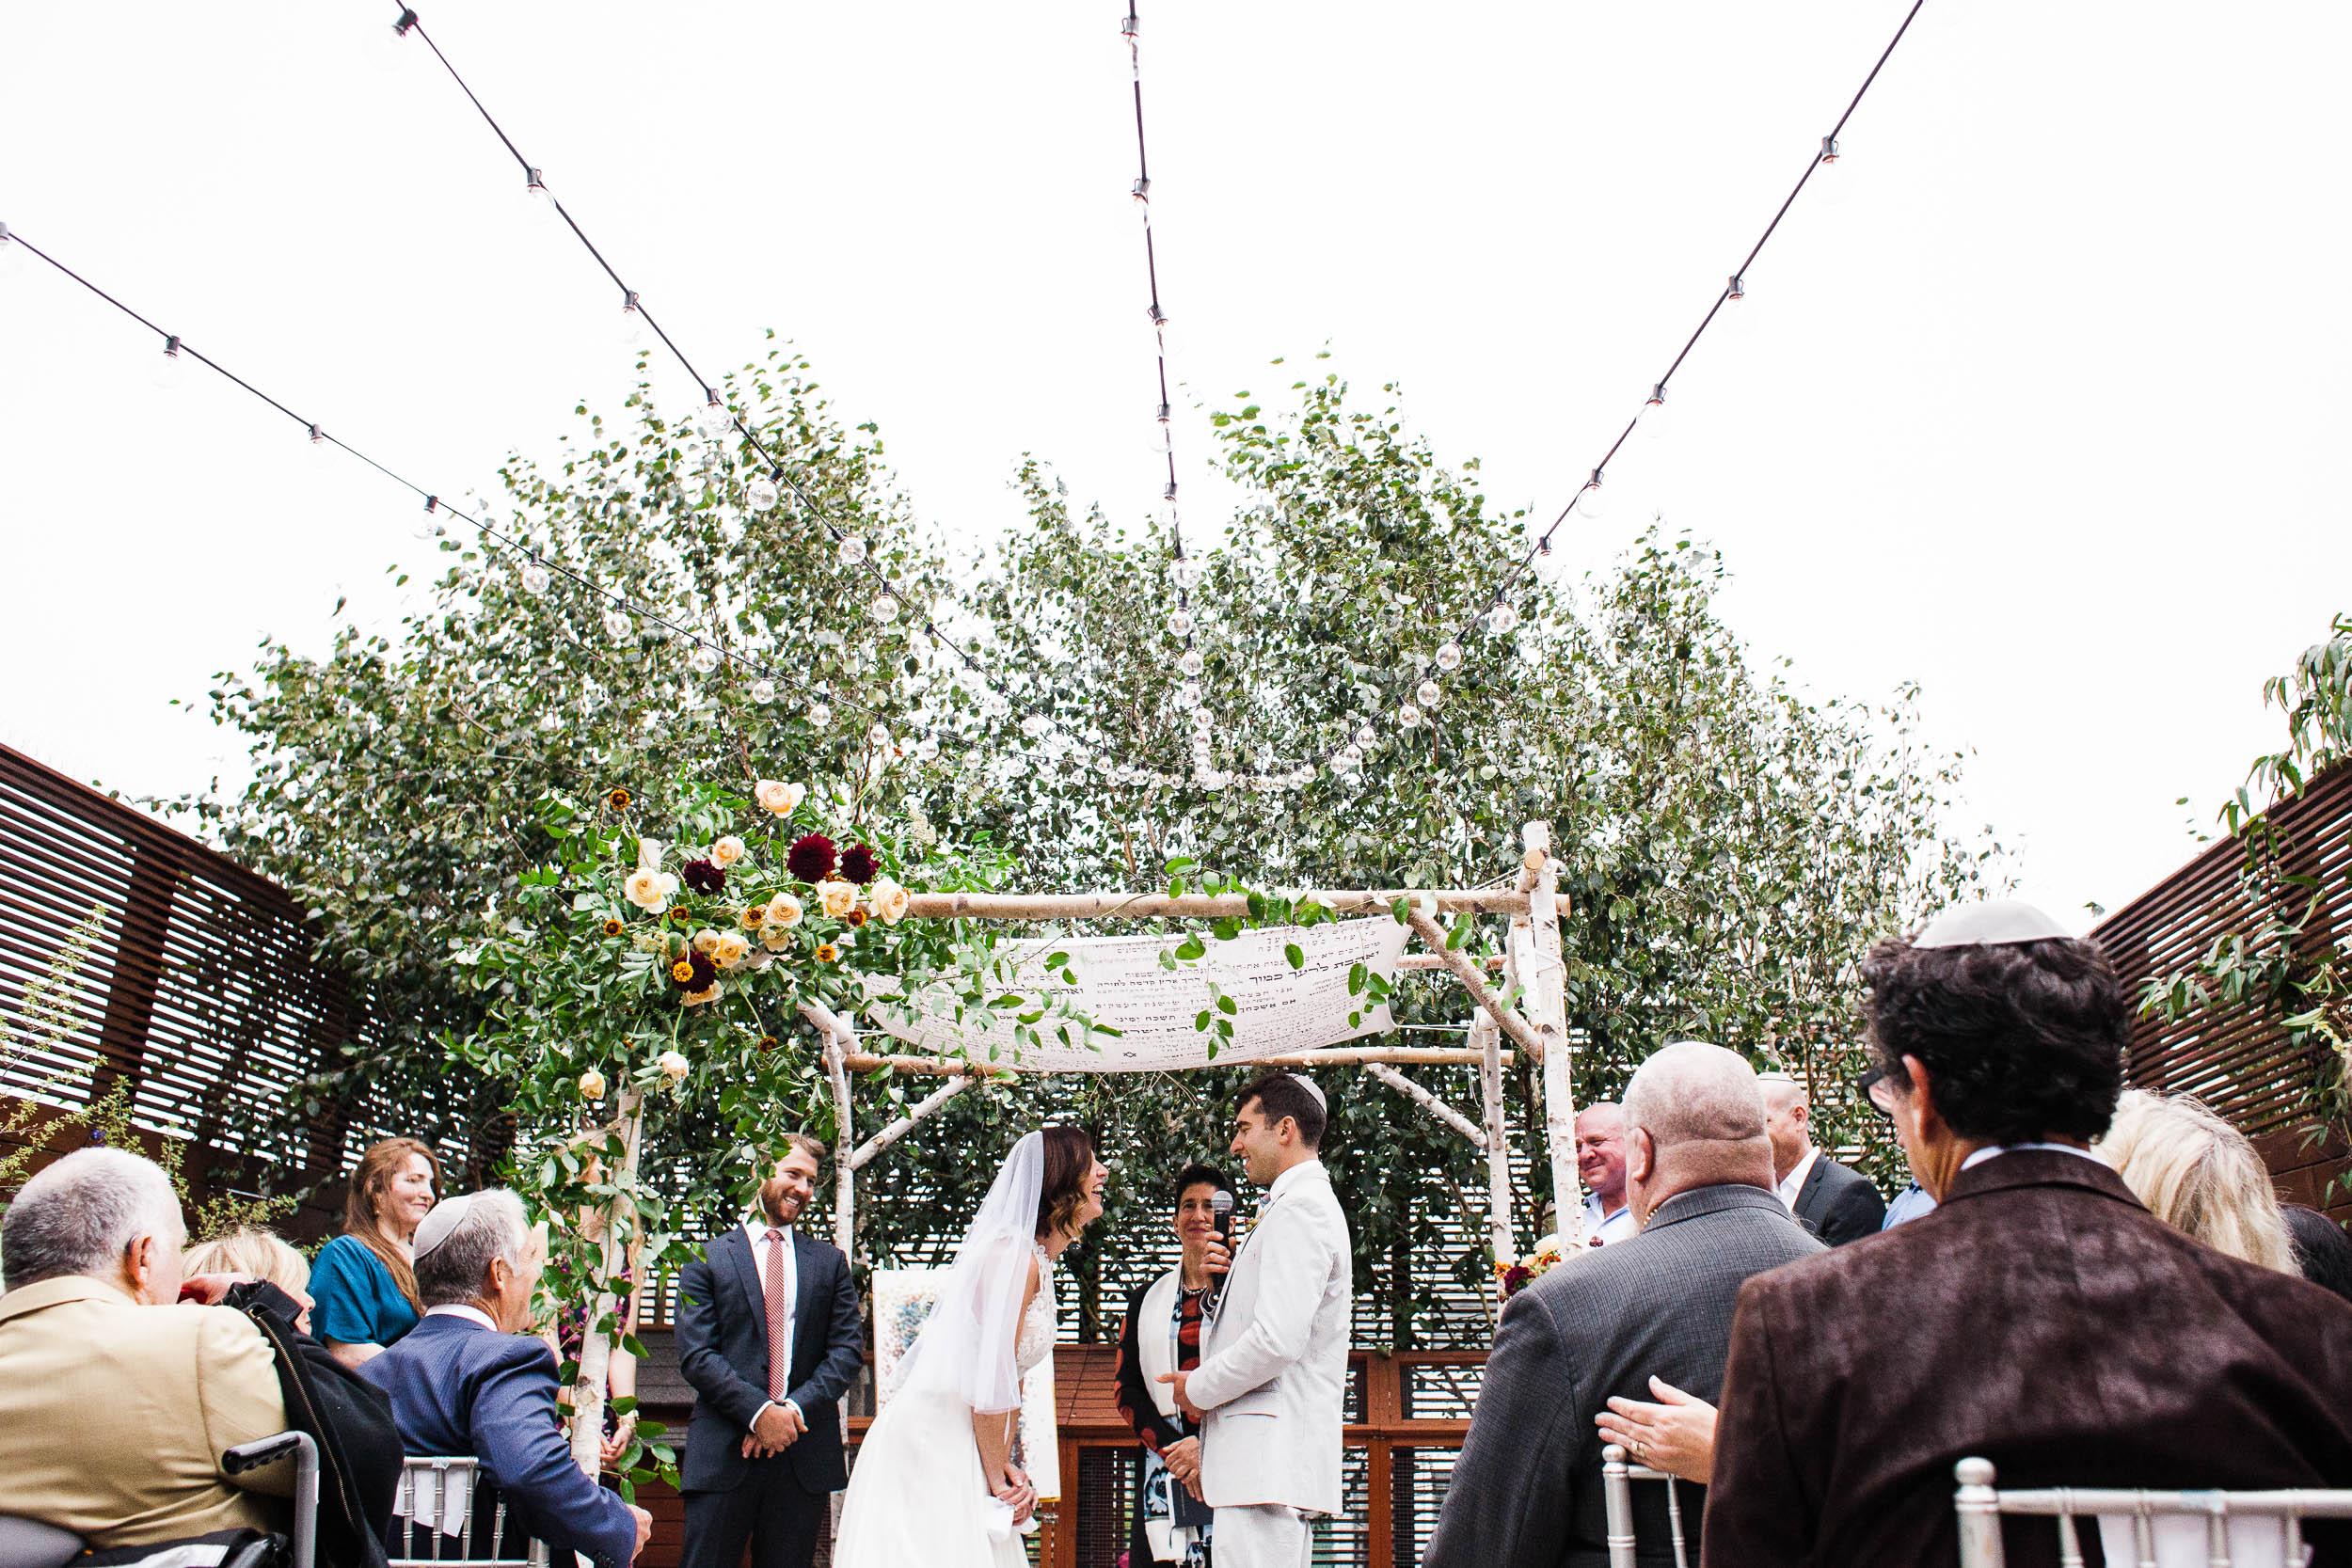 081818_Alina Jason San Francisco Wedding_Buena Lane Photography_1490 copy.jpg